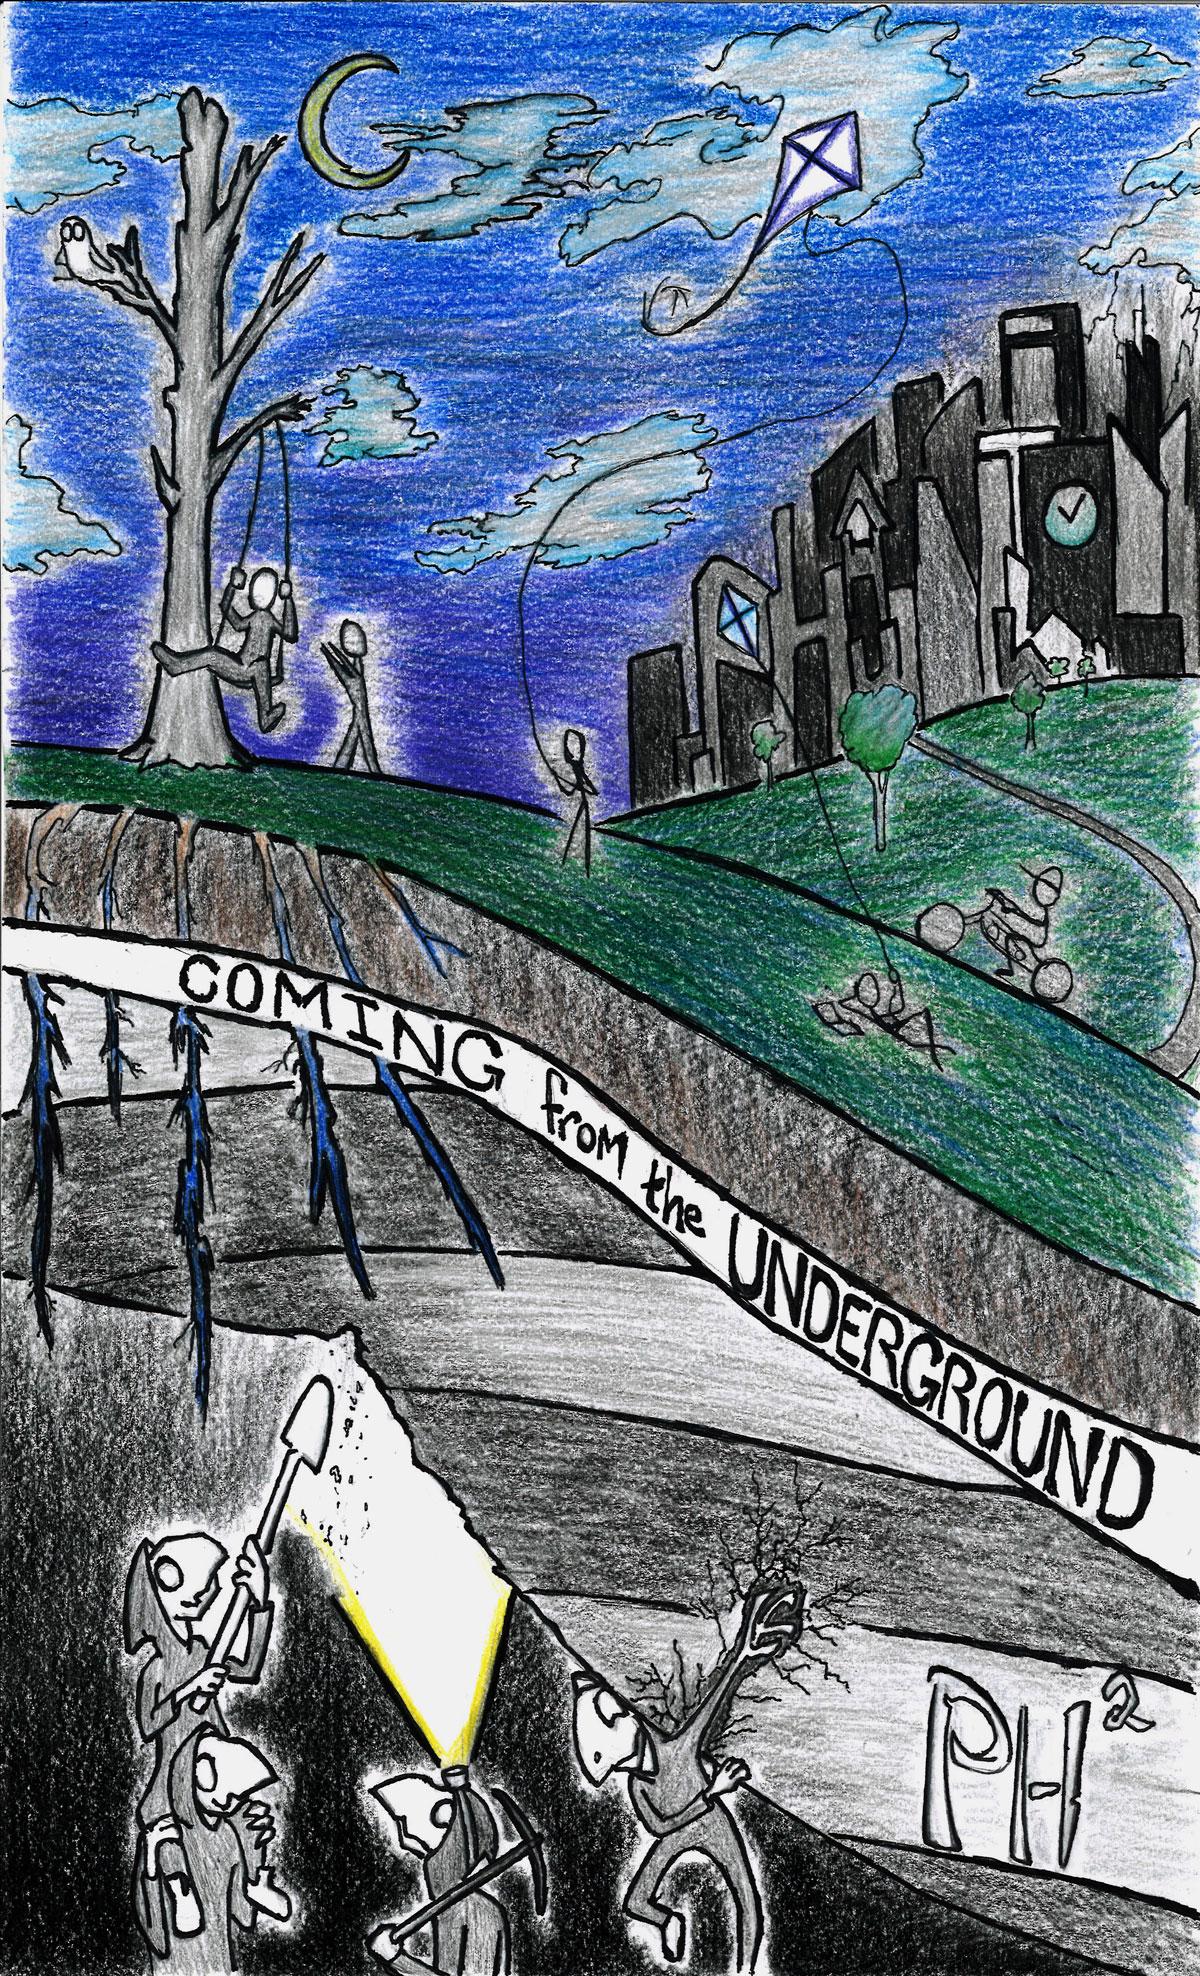 PhantomPhunk_Underground_1500pWeb